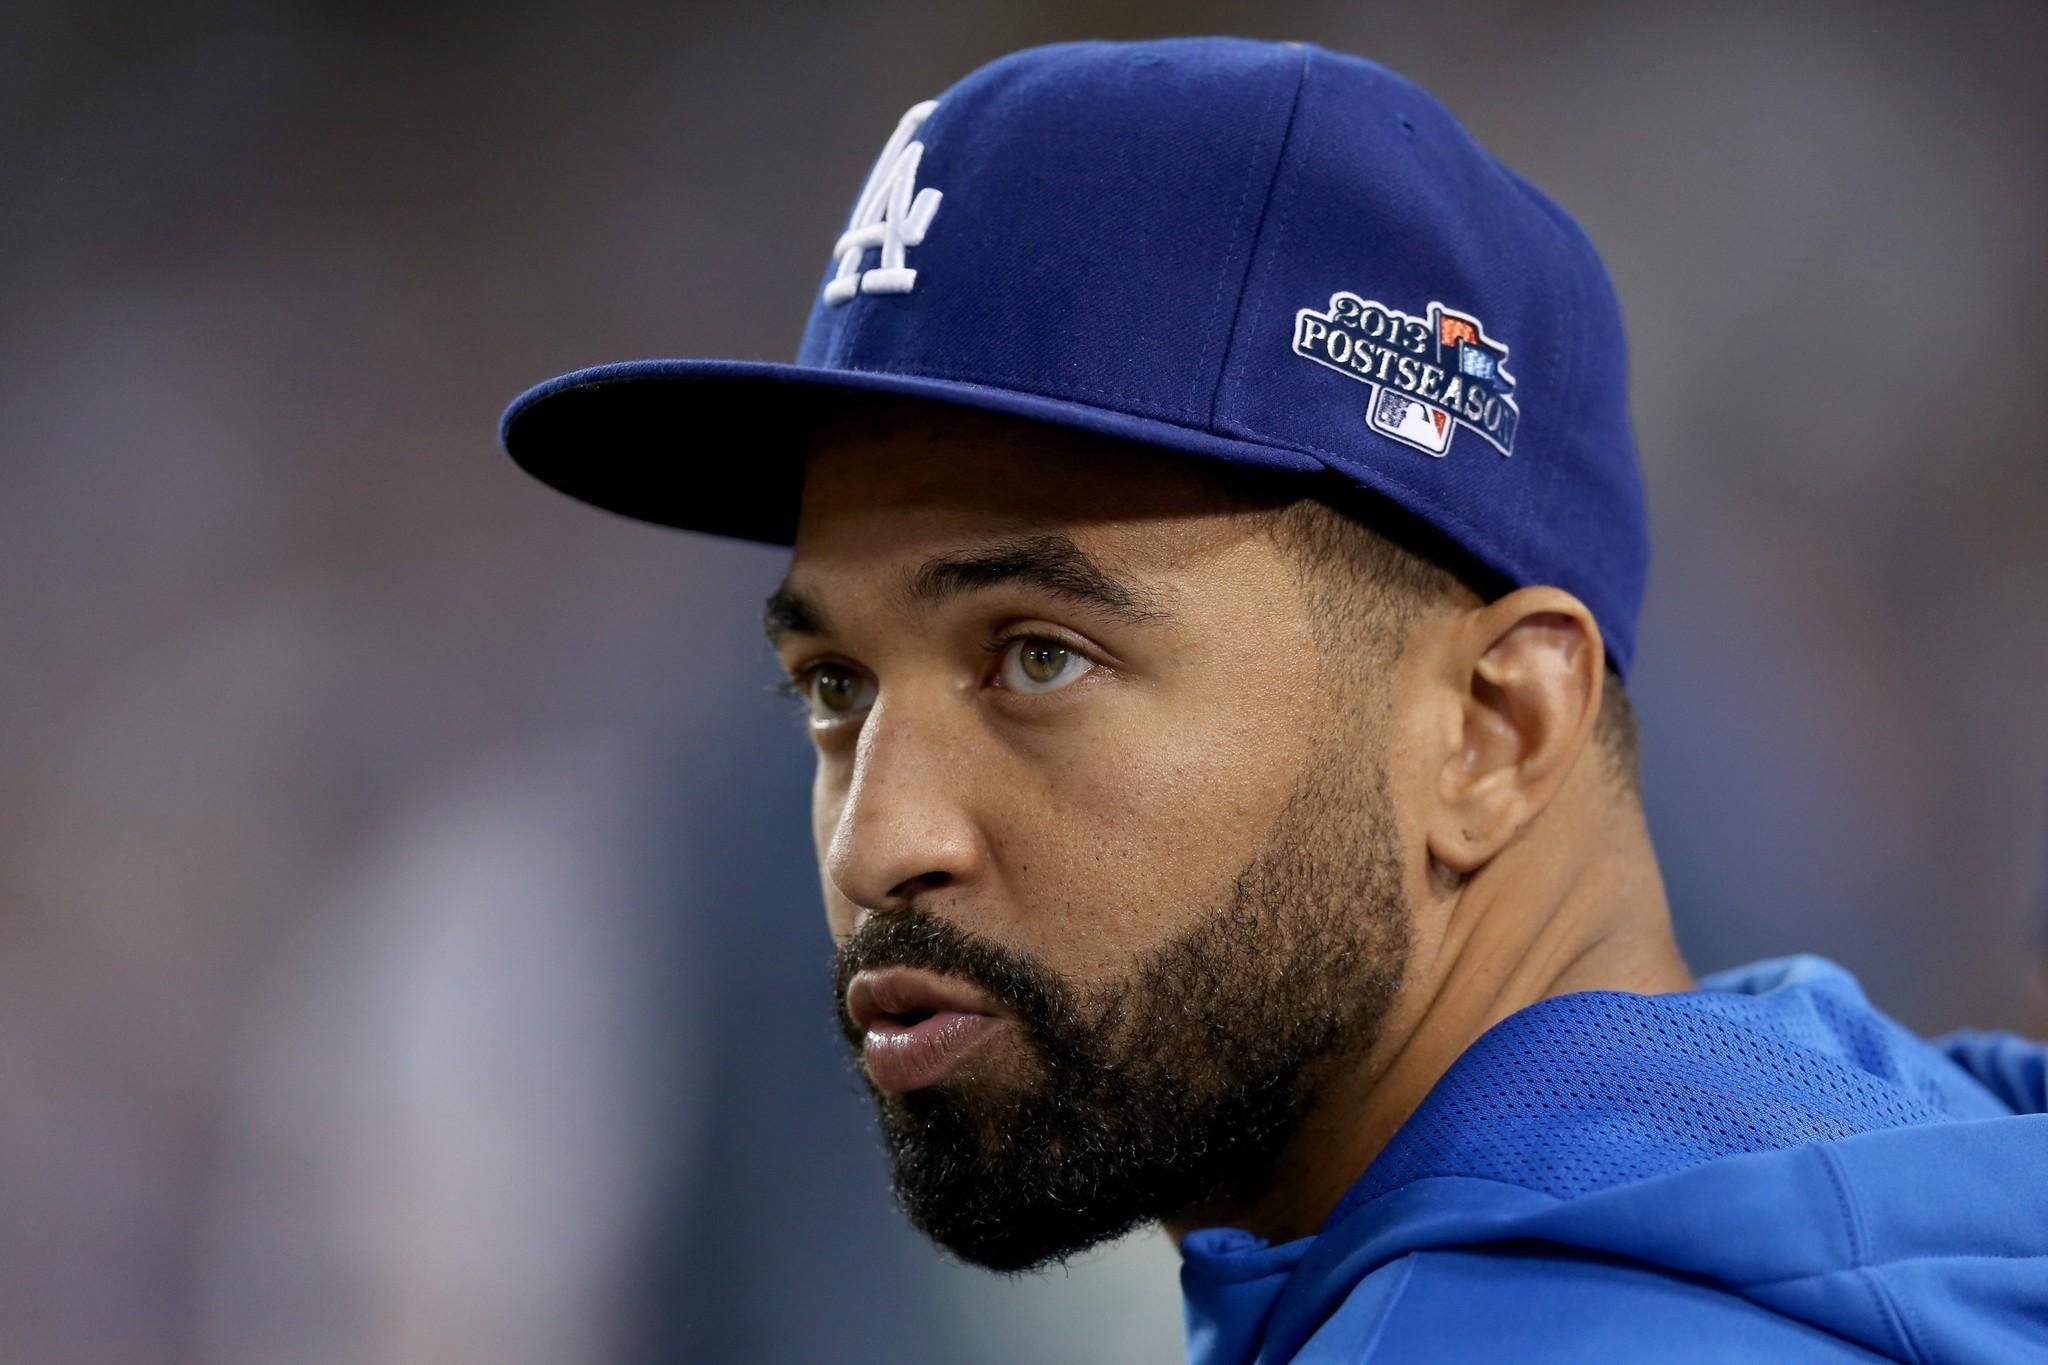 d7819e37ae7fd Dodgers  Matt Kemp   I m not a fourth outfielder  - LA Times